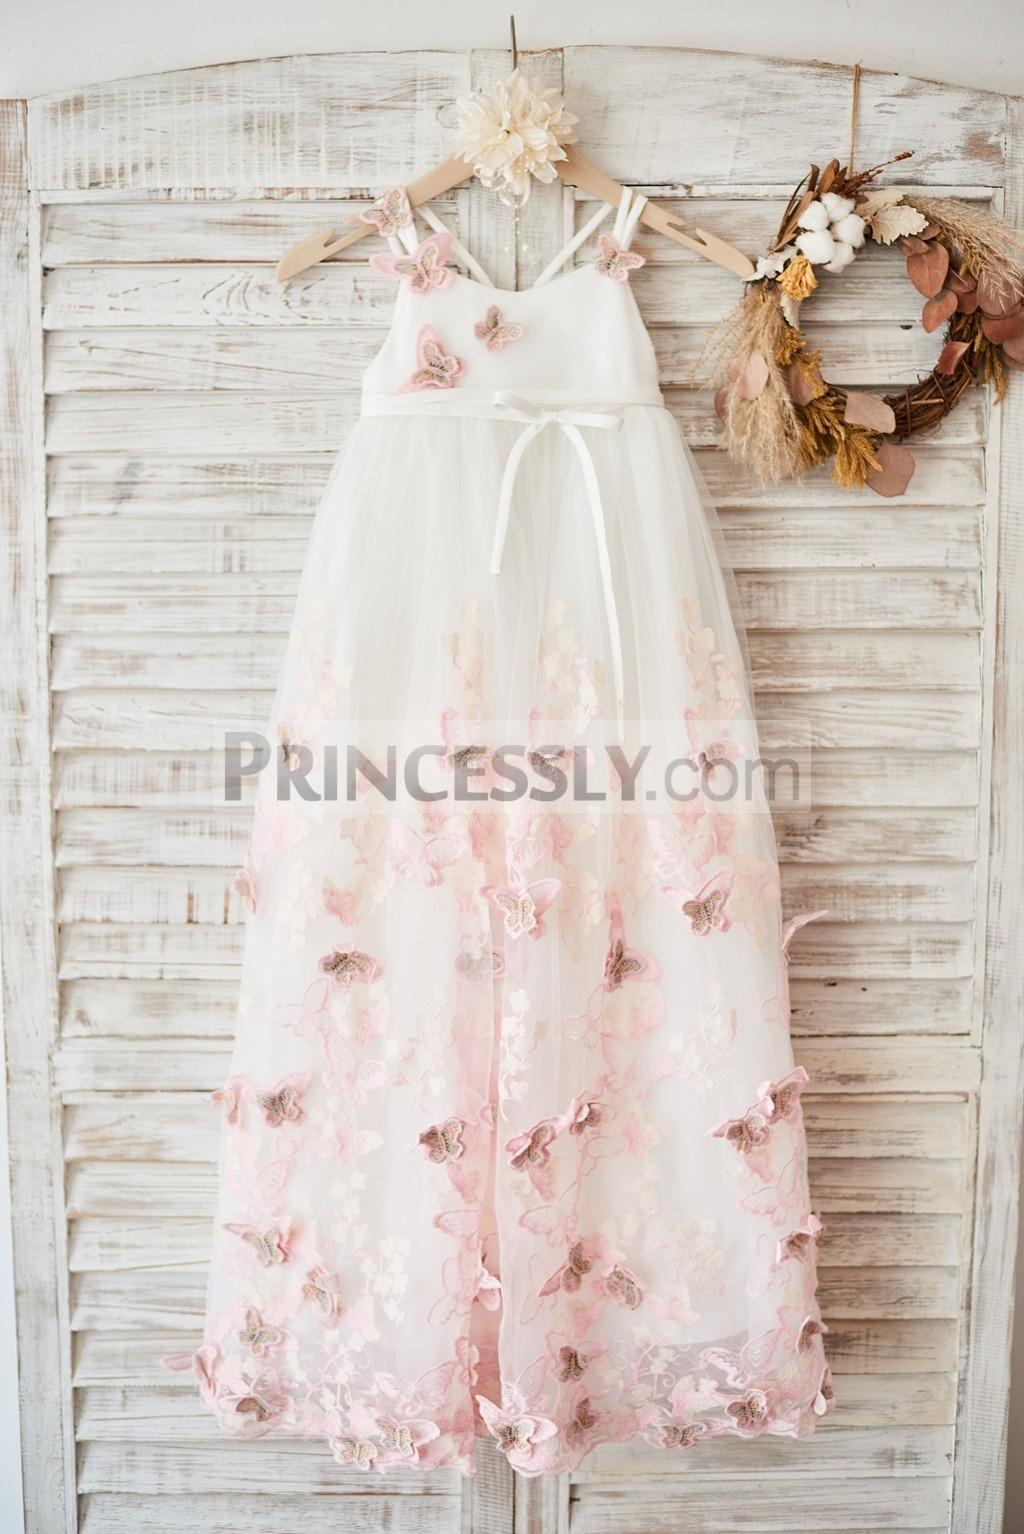 Ivory tulle 3D butterflies wedding baby girl dress